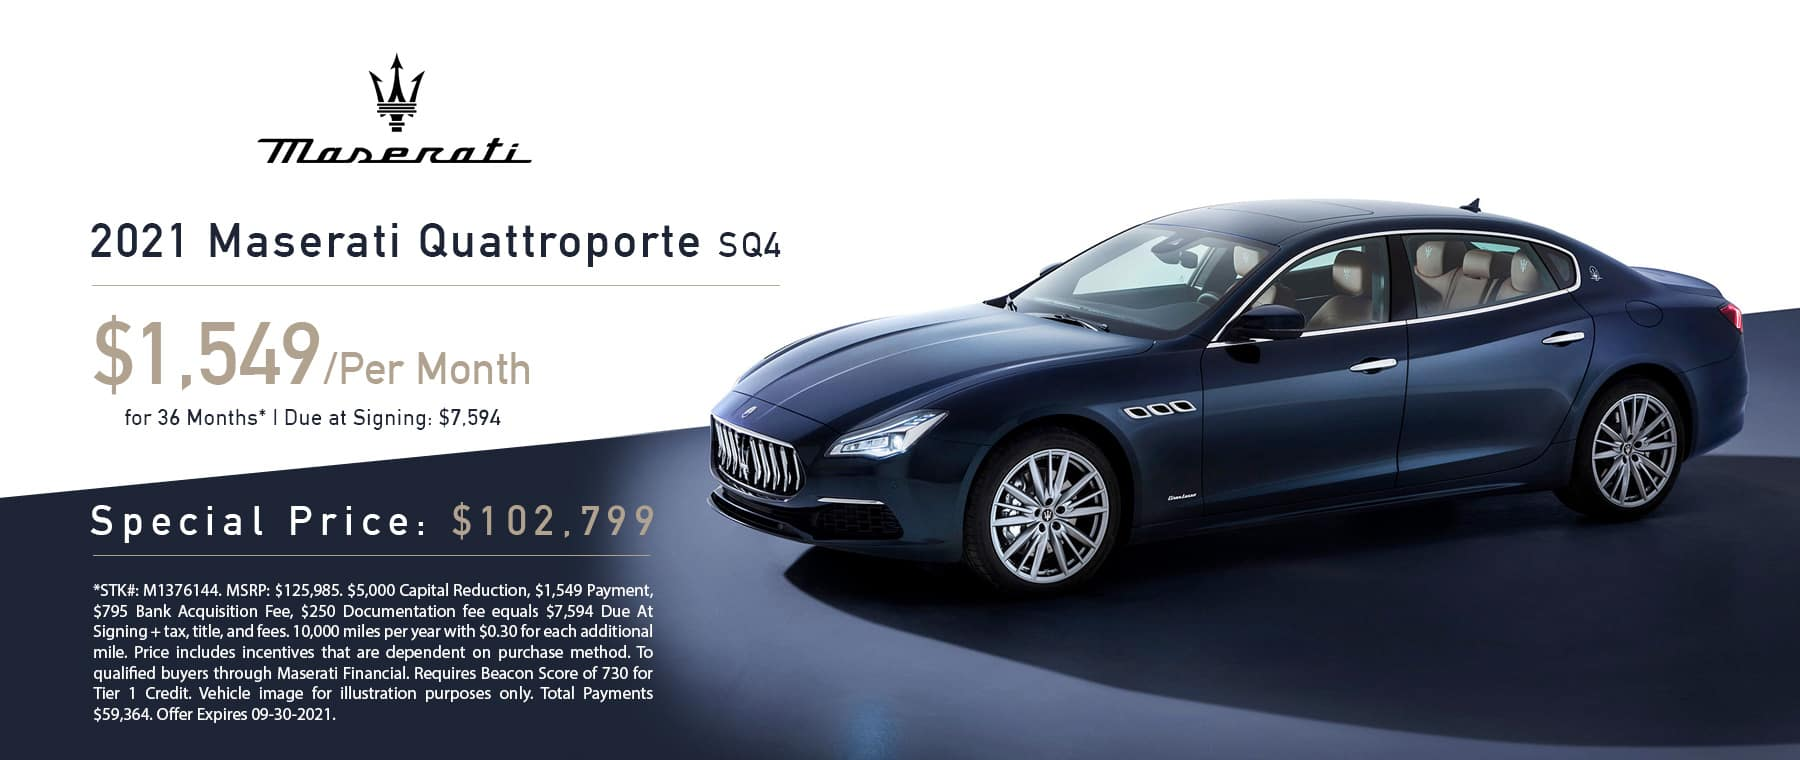 Maserati_2021_Quattroporte_Slide_Sep2021_1